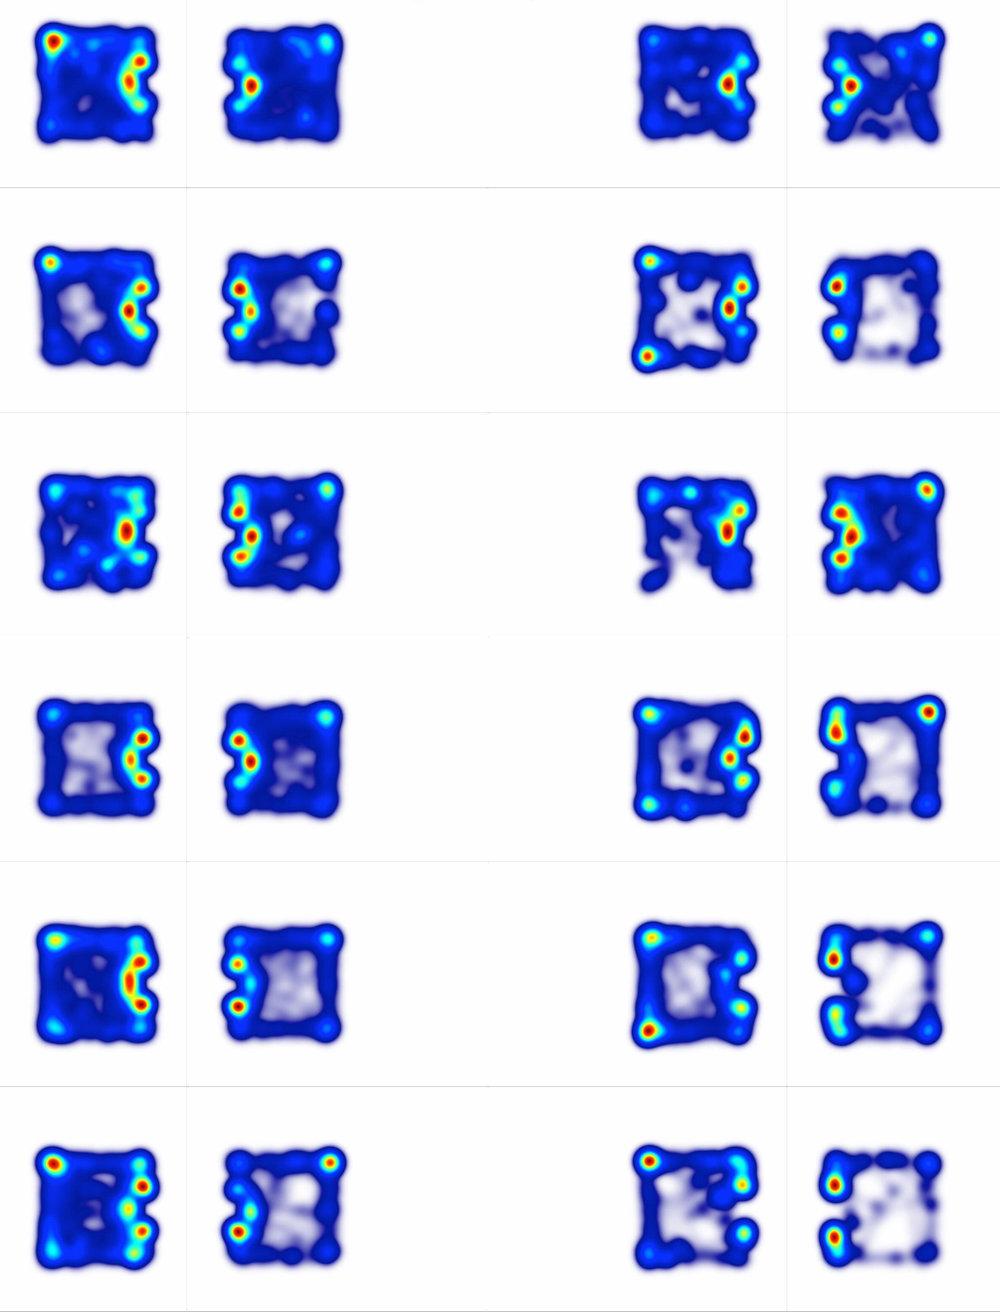 4D2EE9D2-3A17-49C6-9C54-B05B94825FF5.jpeg